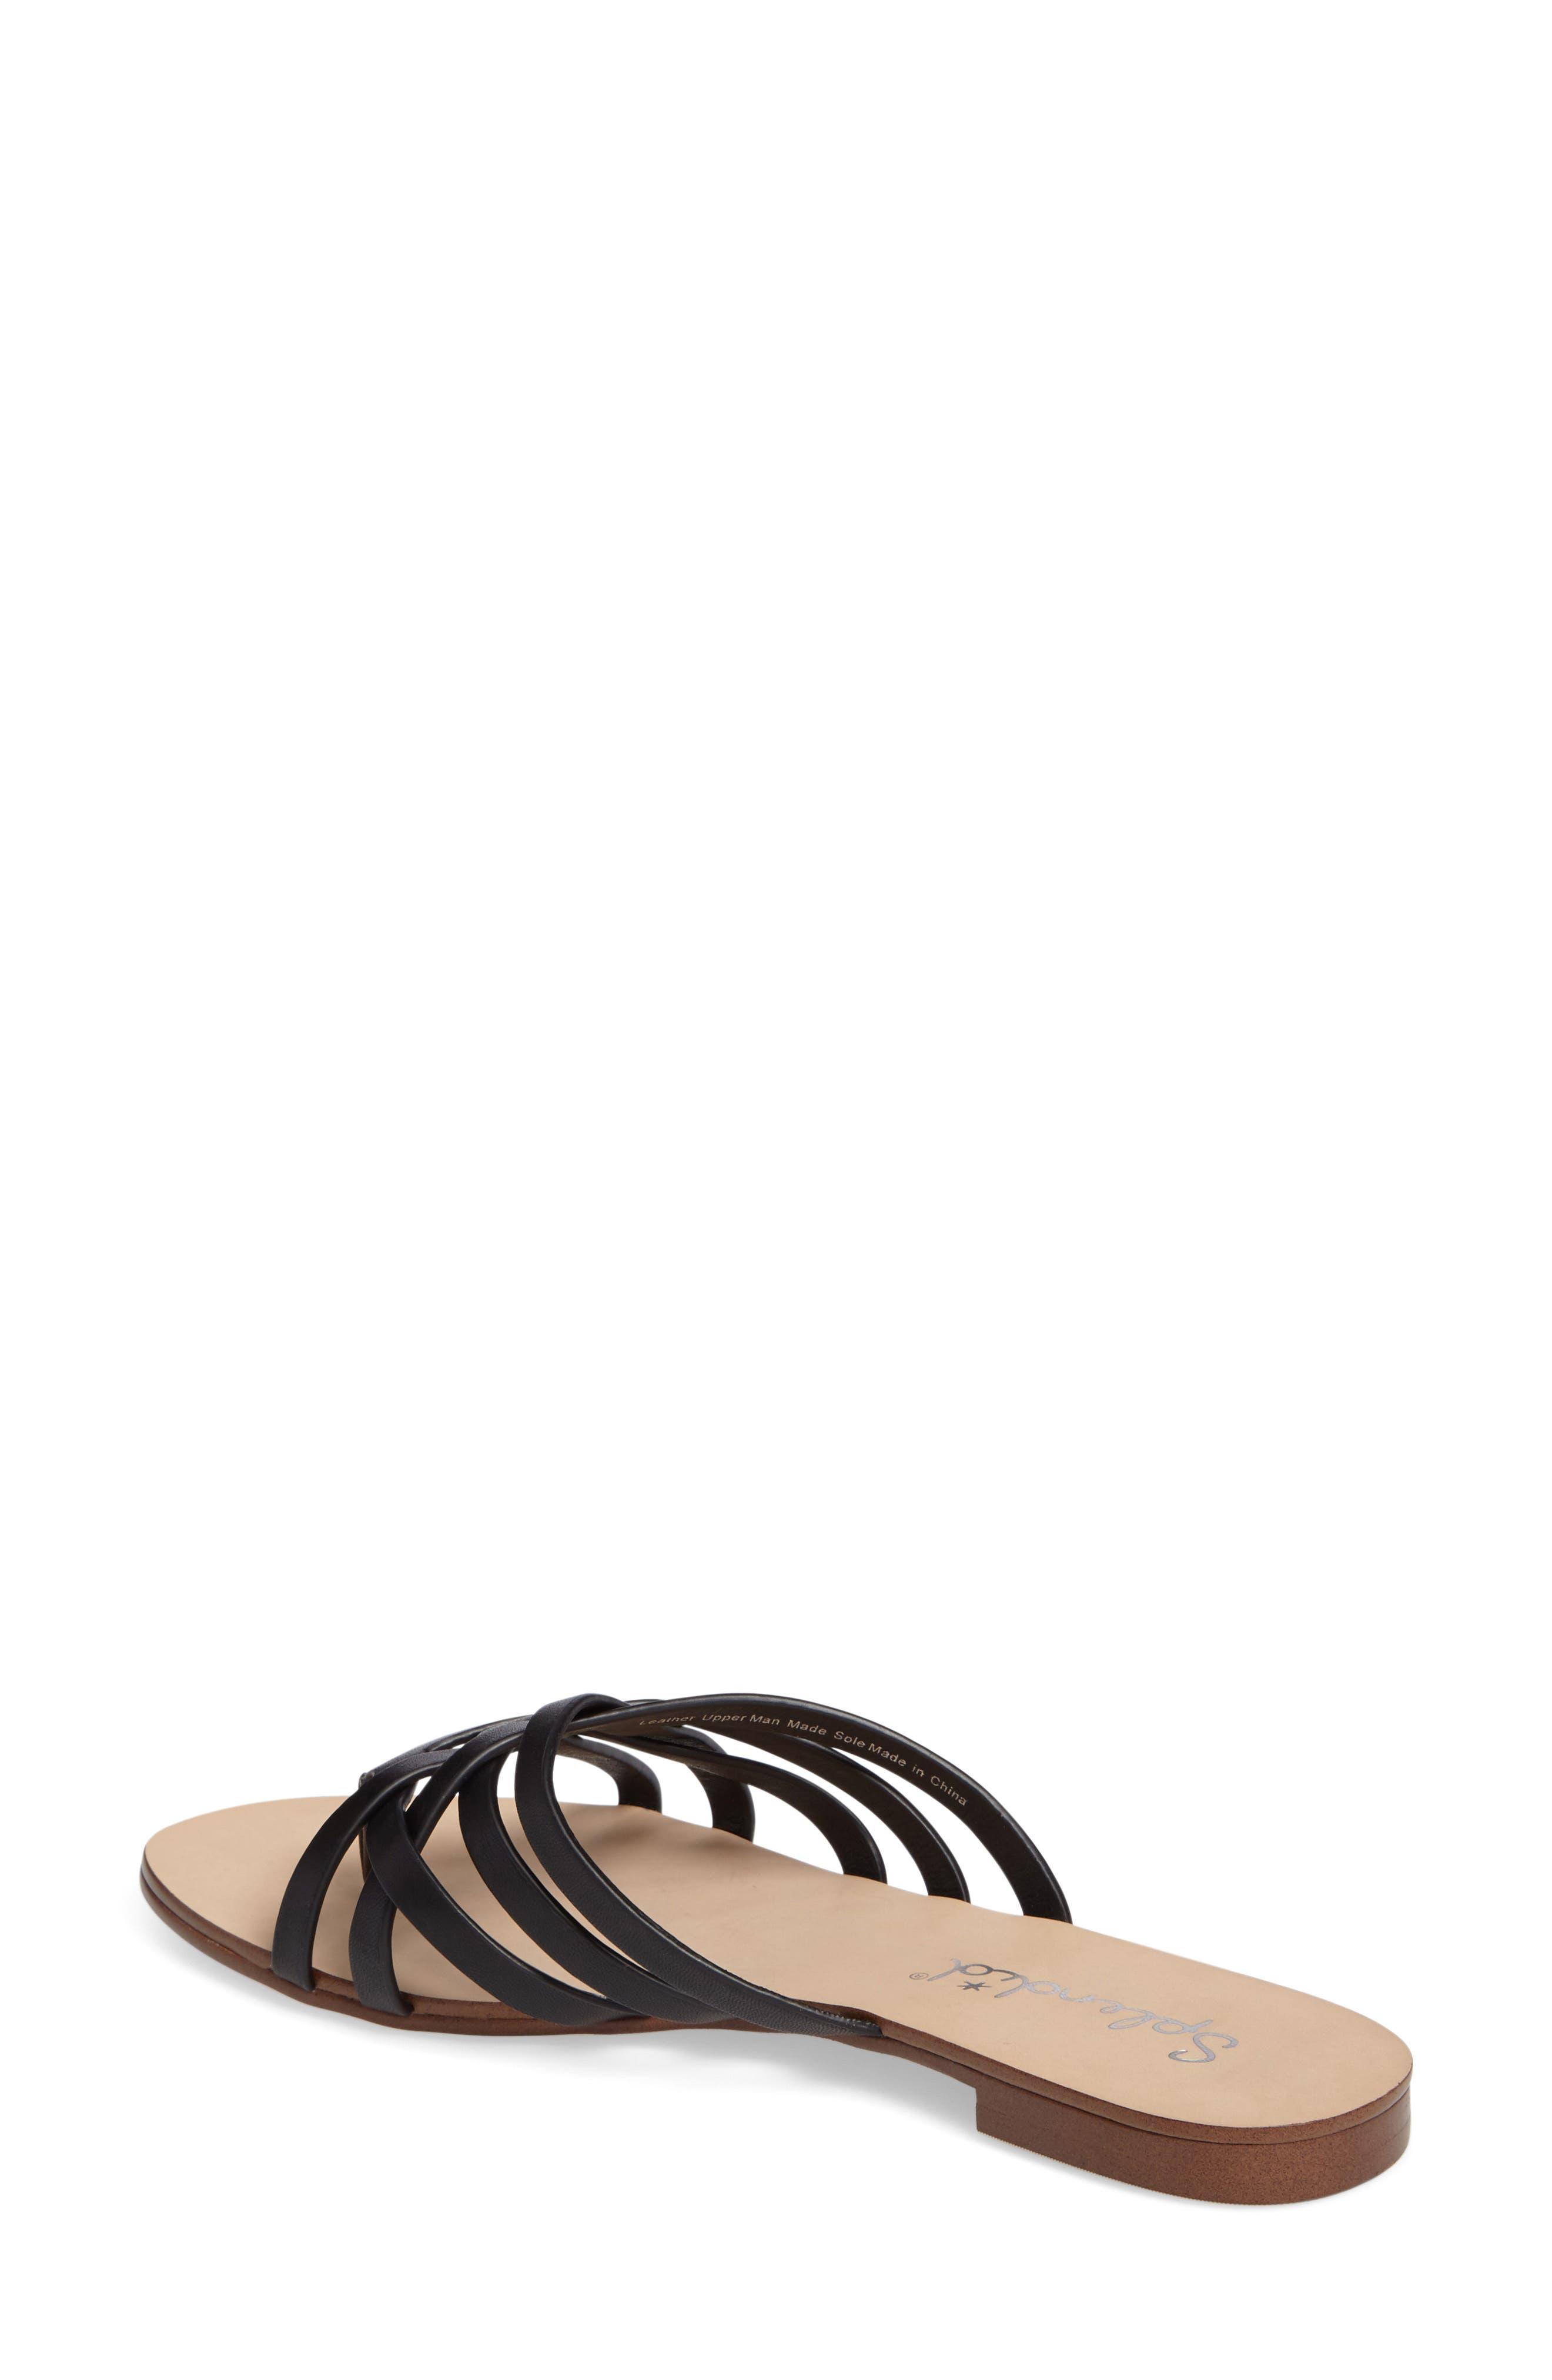 Jojo Slide Sandal,                             Alternate thumbnail 2, color,                             Black Leather